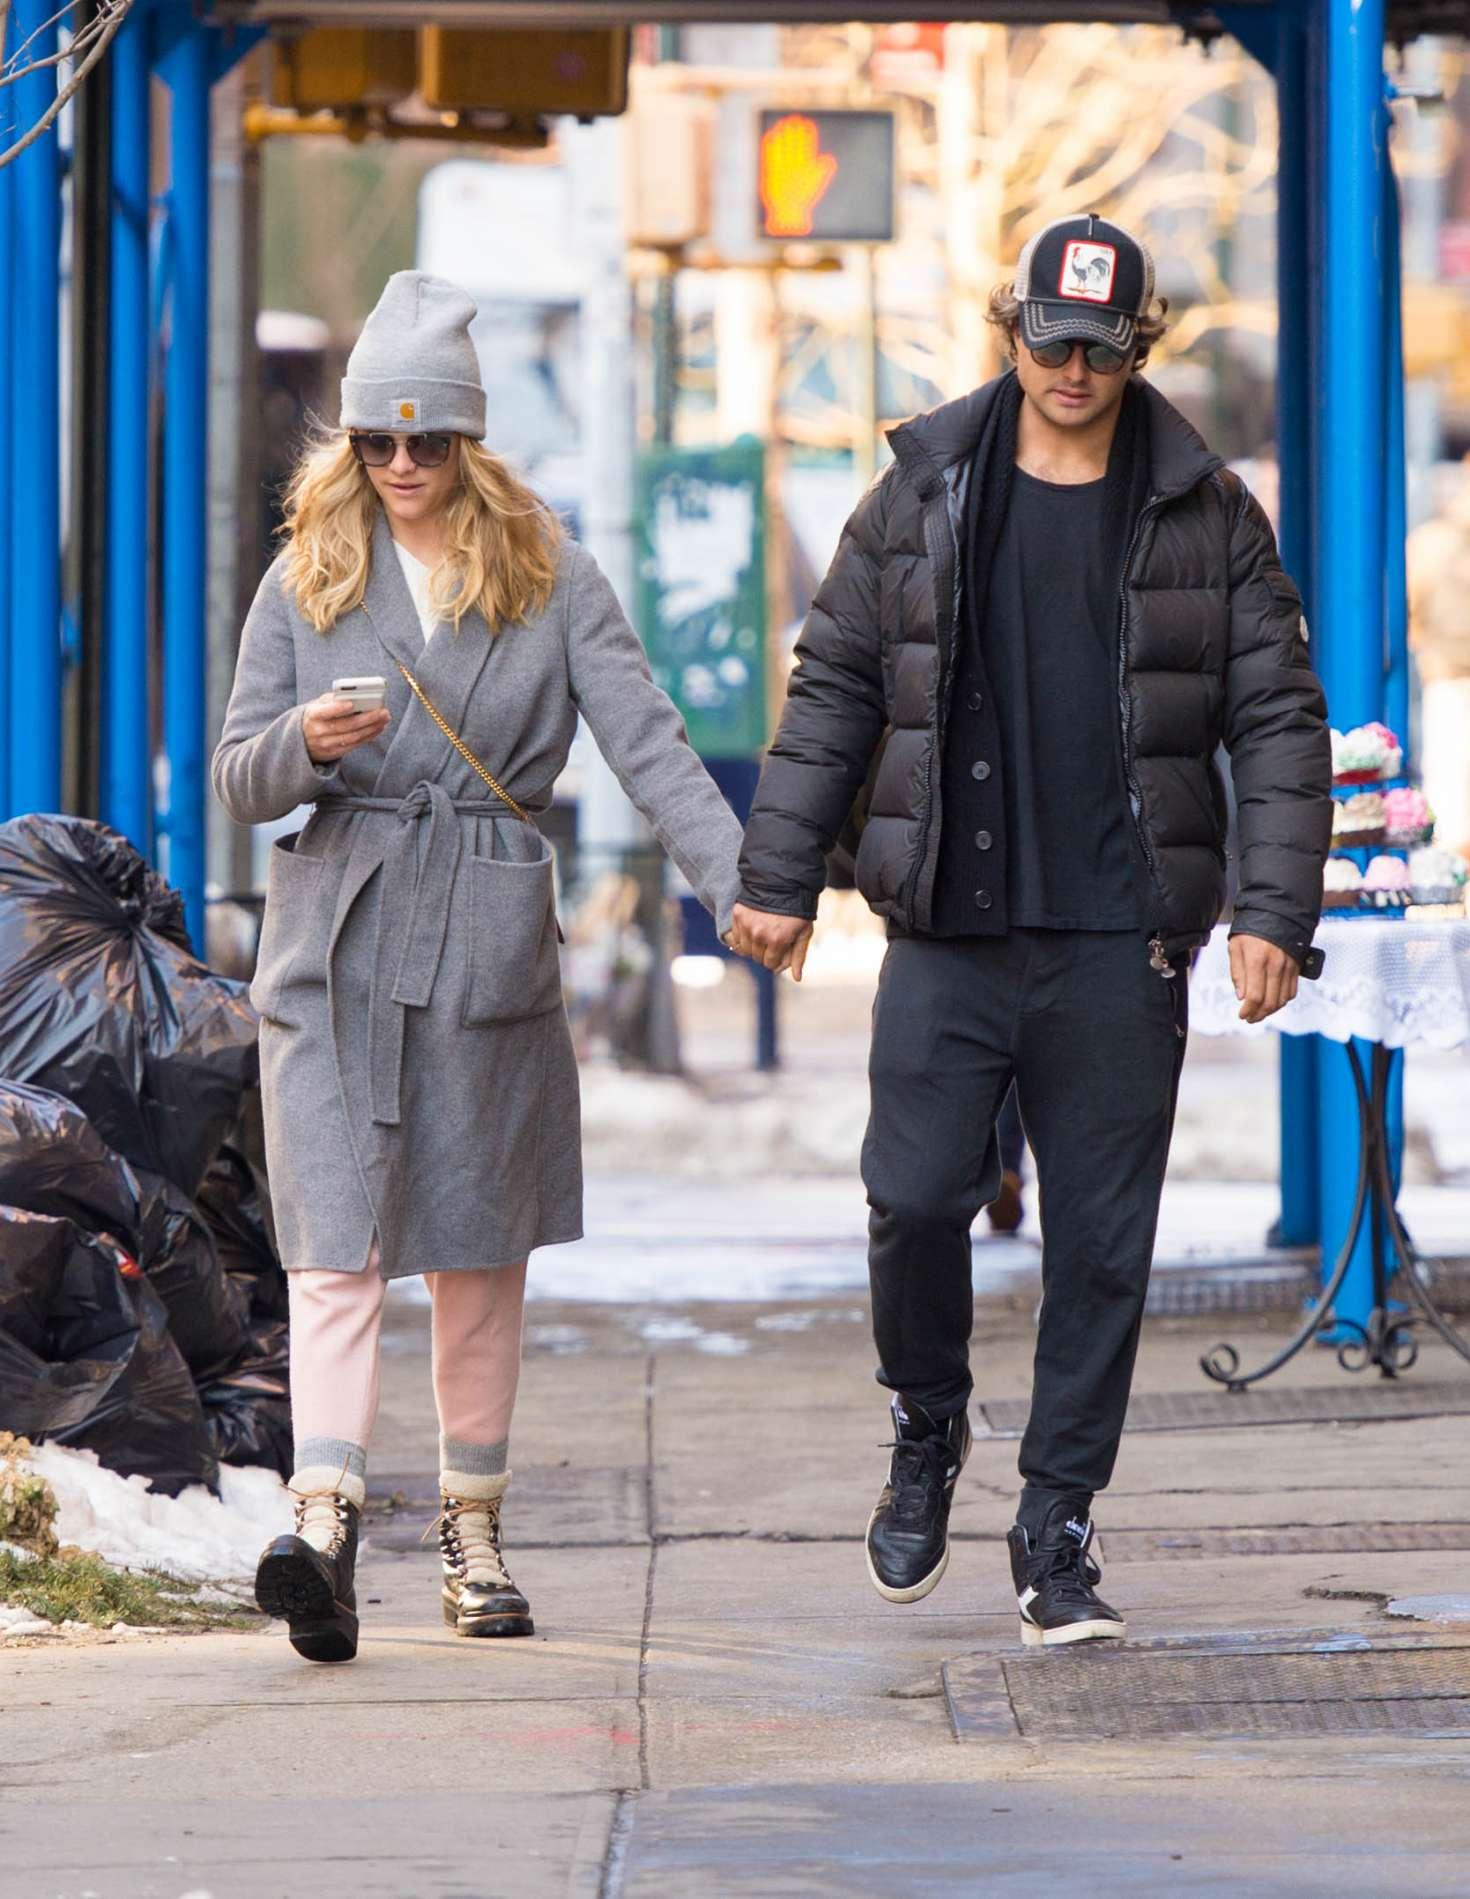 Nina Agdal 2018 : Nina Agdal: Shopping with boyfriend Jack Brinkley-Cook -17